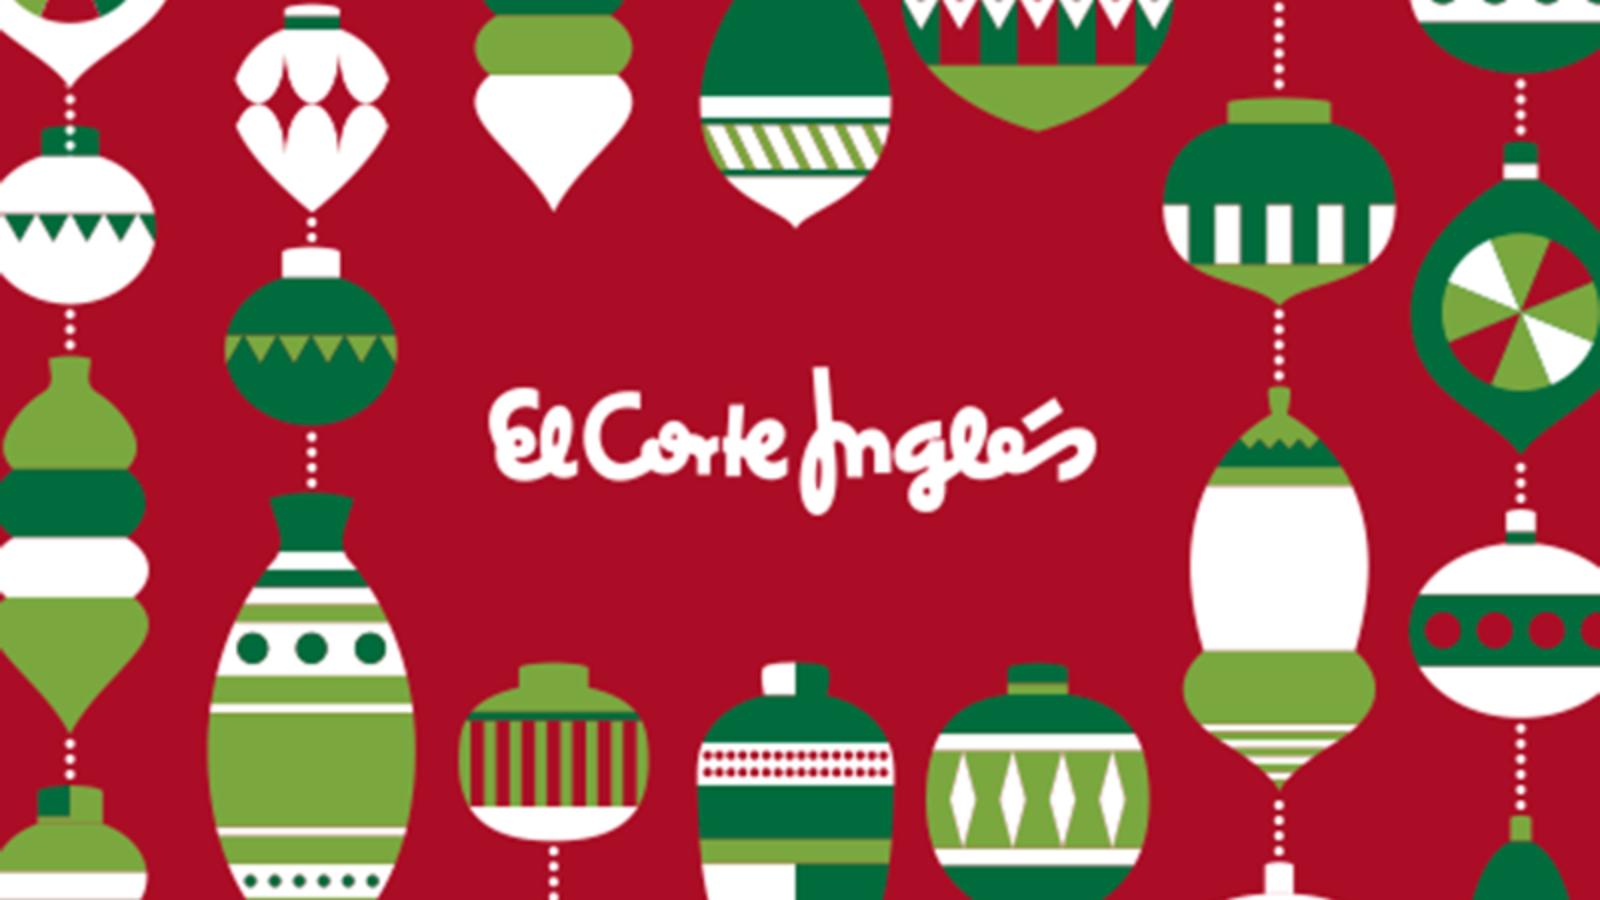 elcorteingles-103536